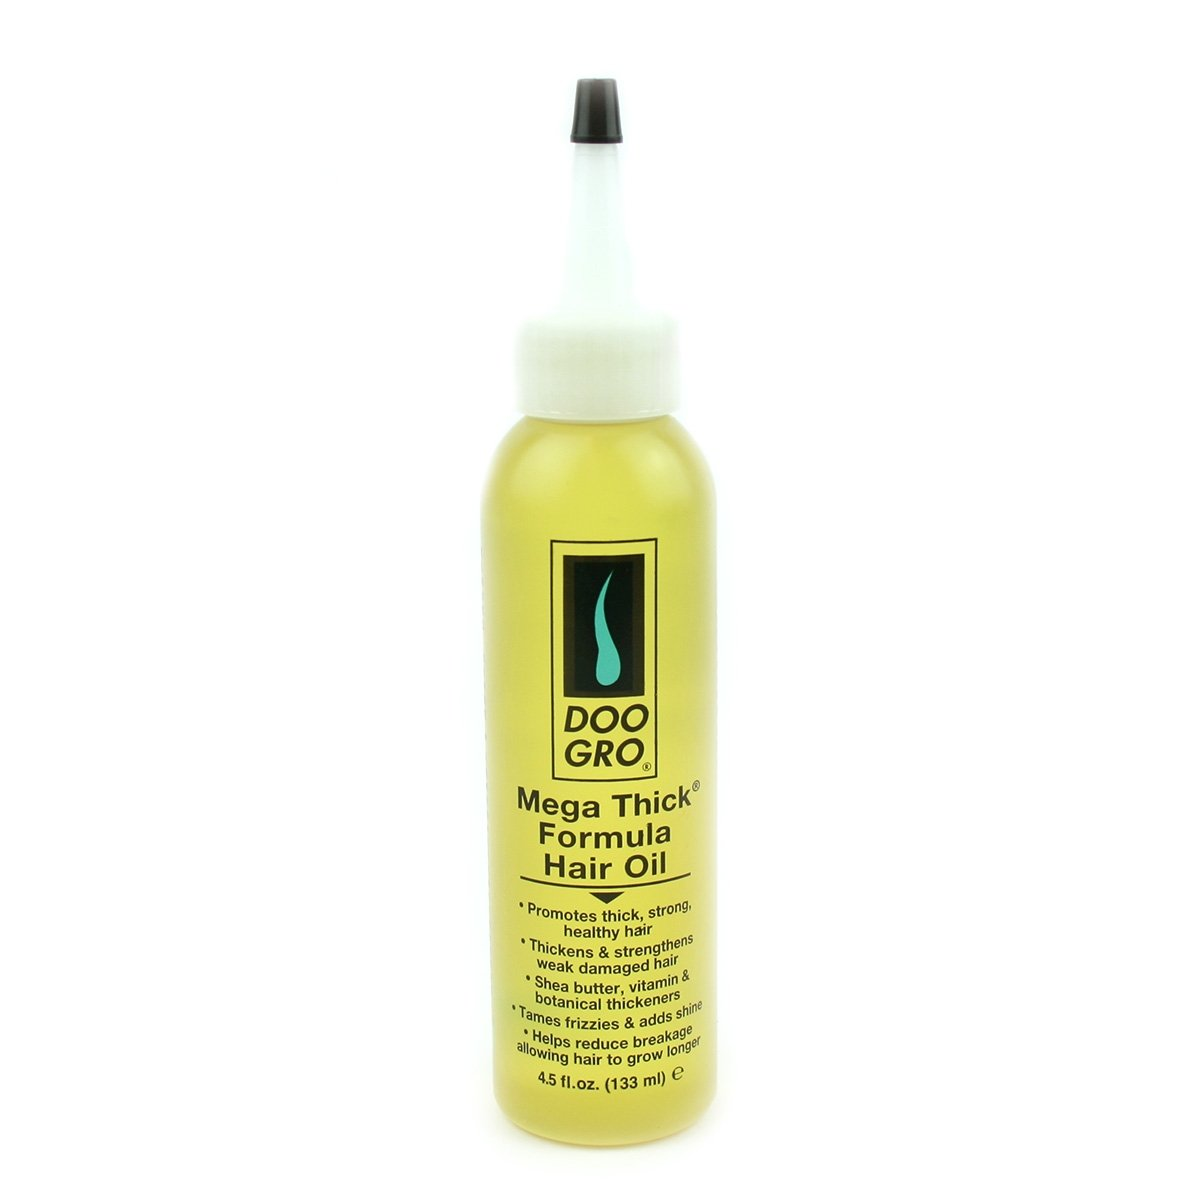 DOO GRO Mega Thick Hair Oil, 4.5 oz